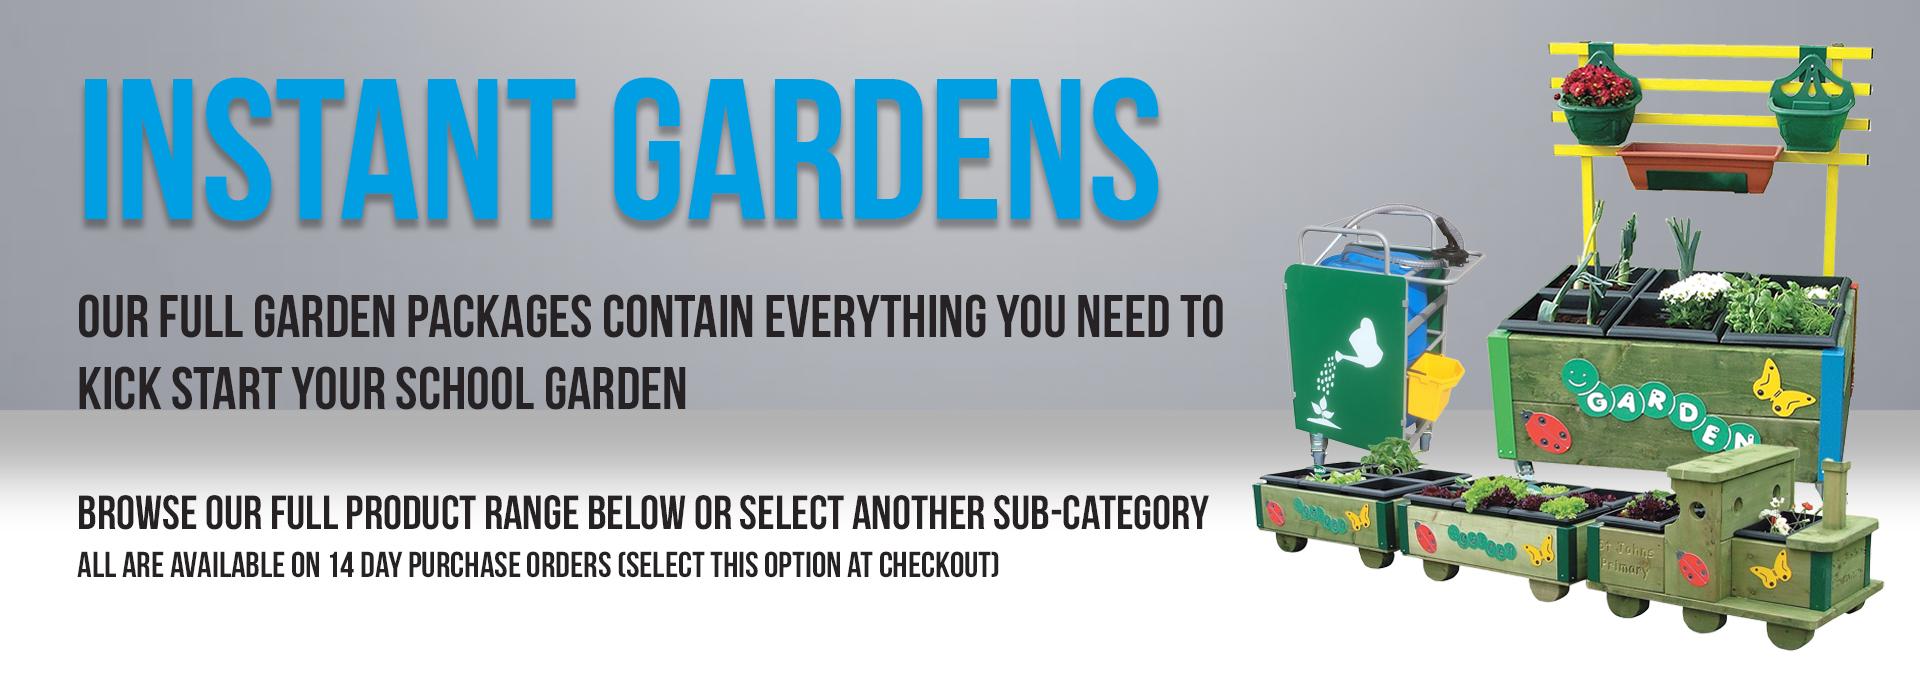 instant-garden-banner.jpg